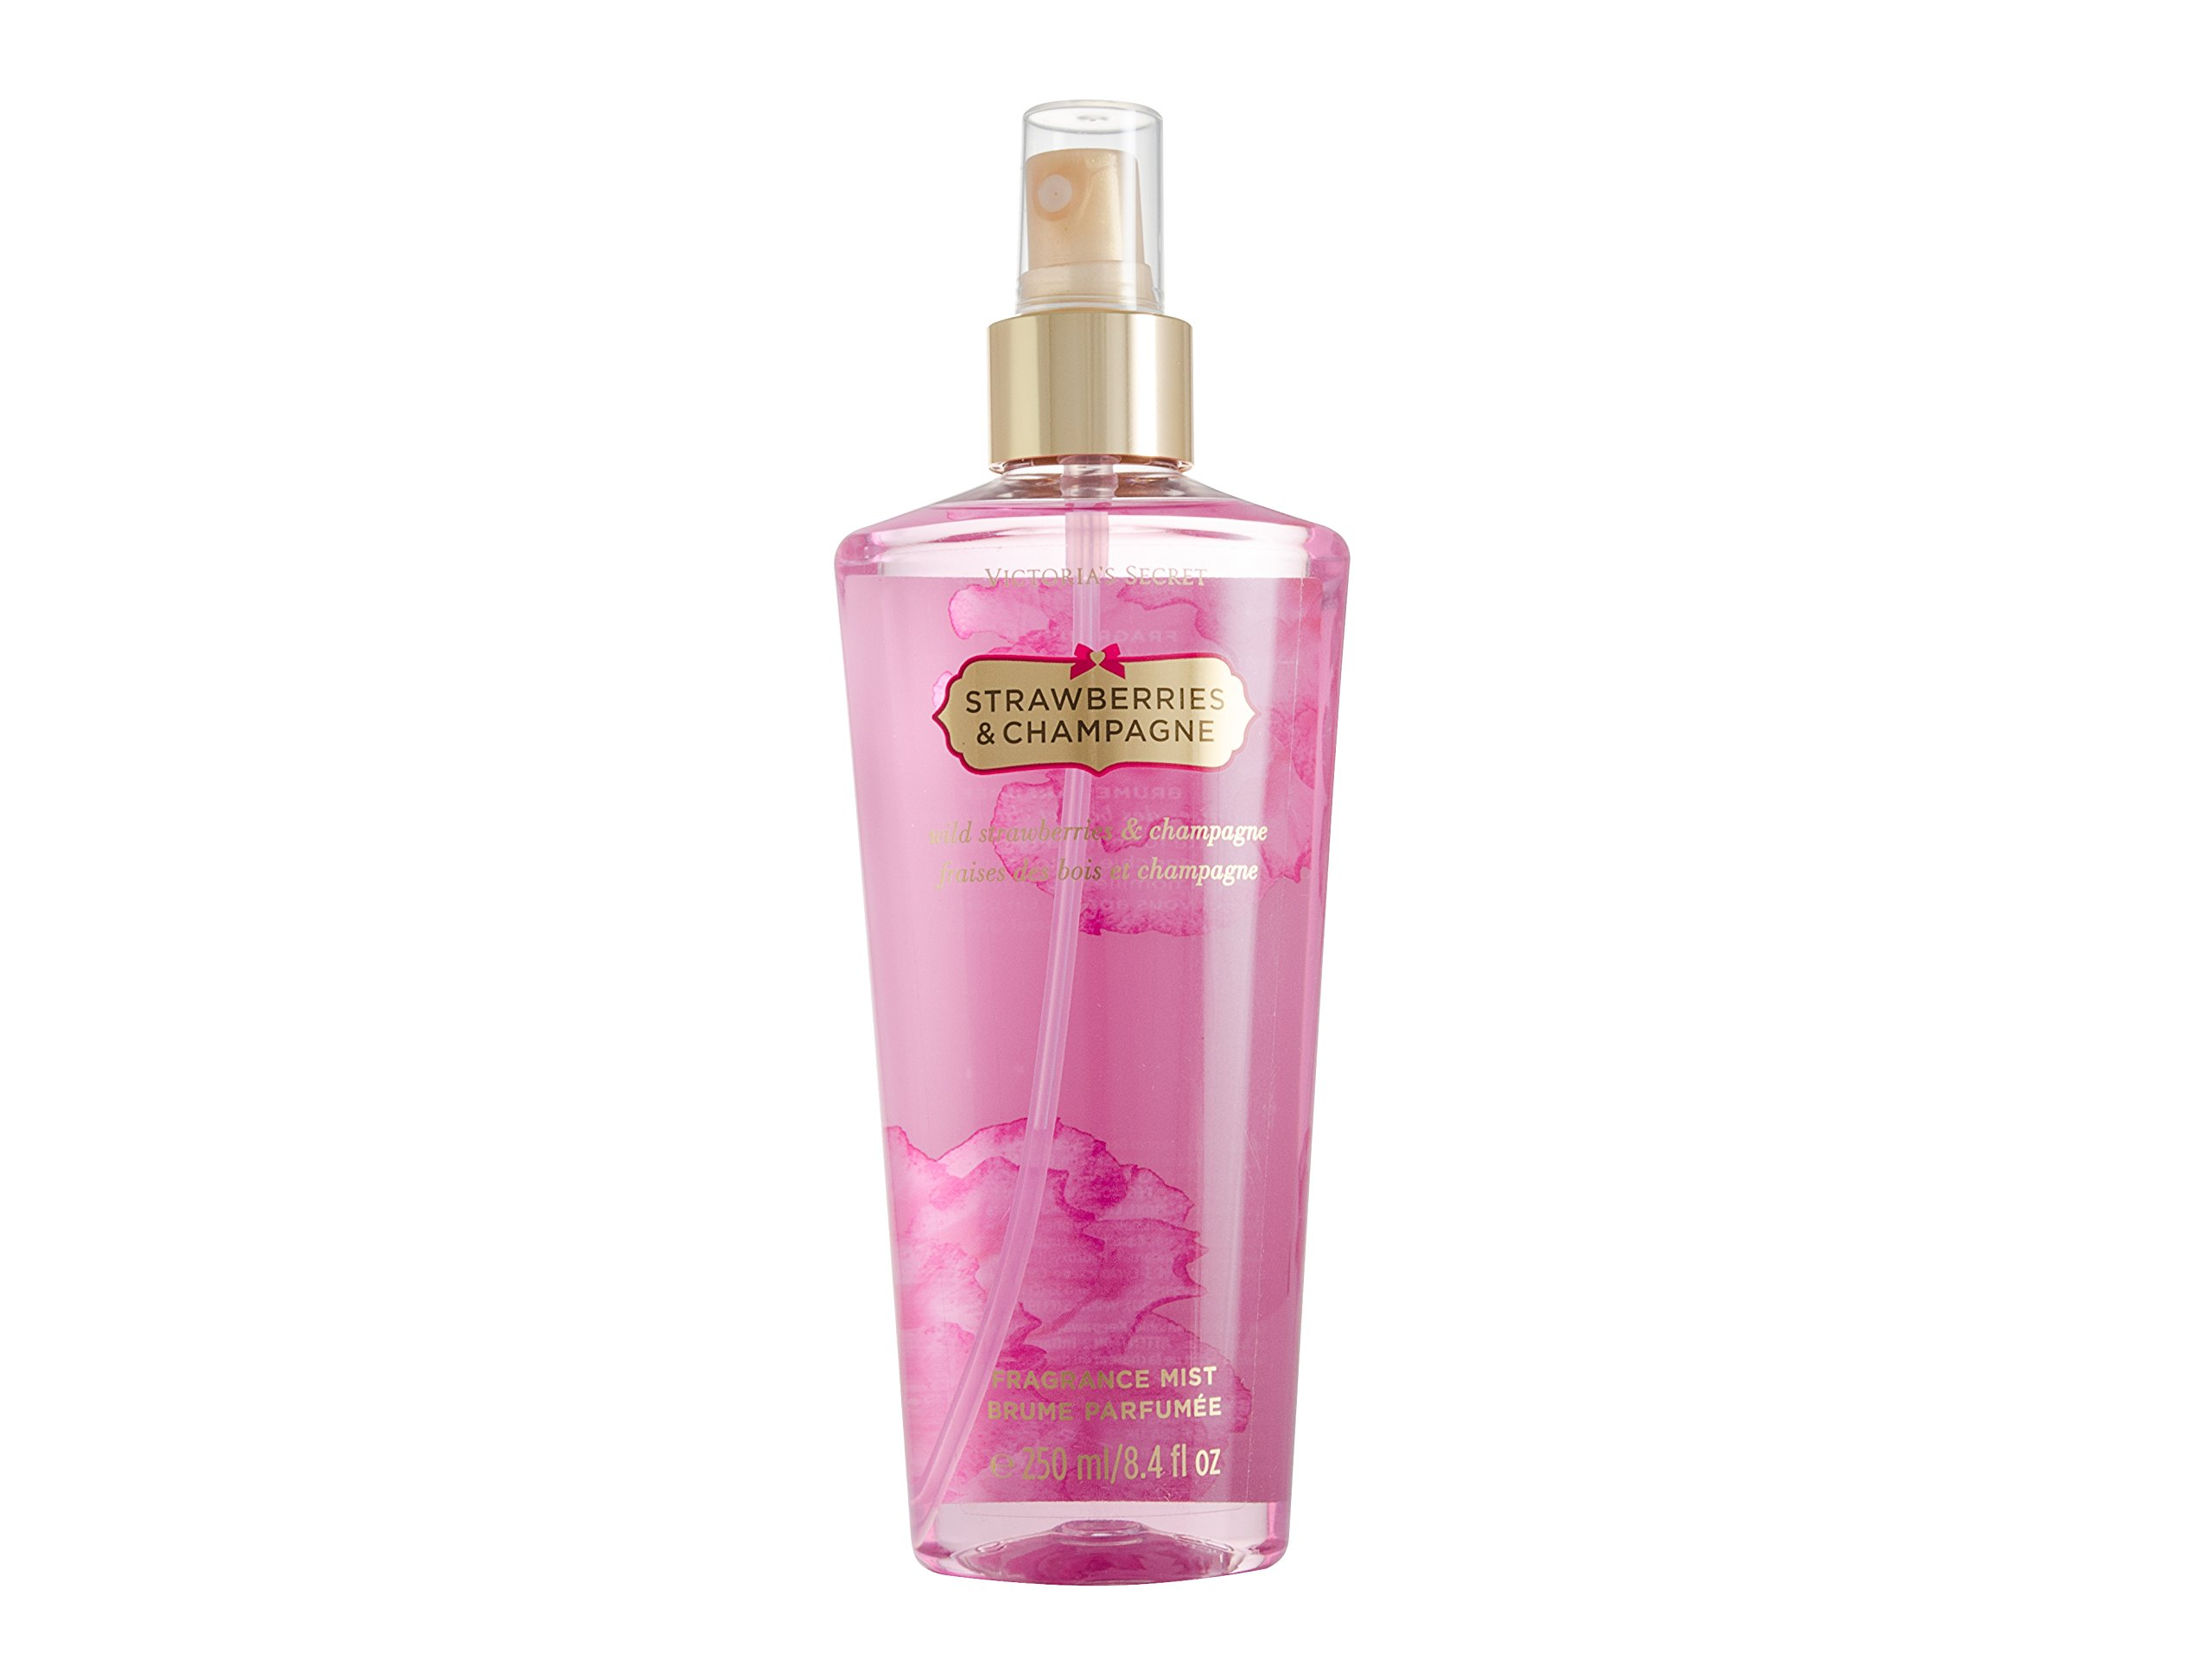 Victorias Secret Strawberries Champagne Gift Set Body Foam Secrets Fantasies Fragrance Mist 84